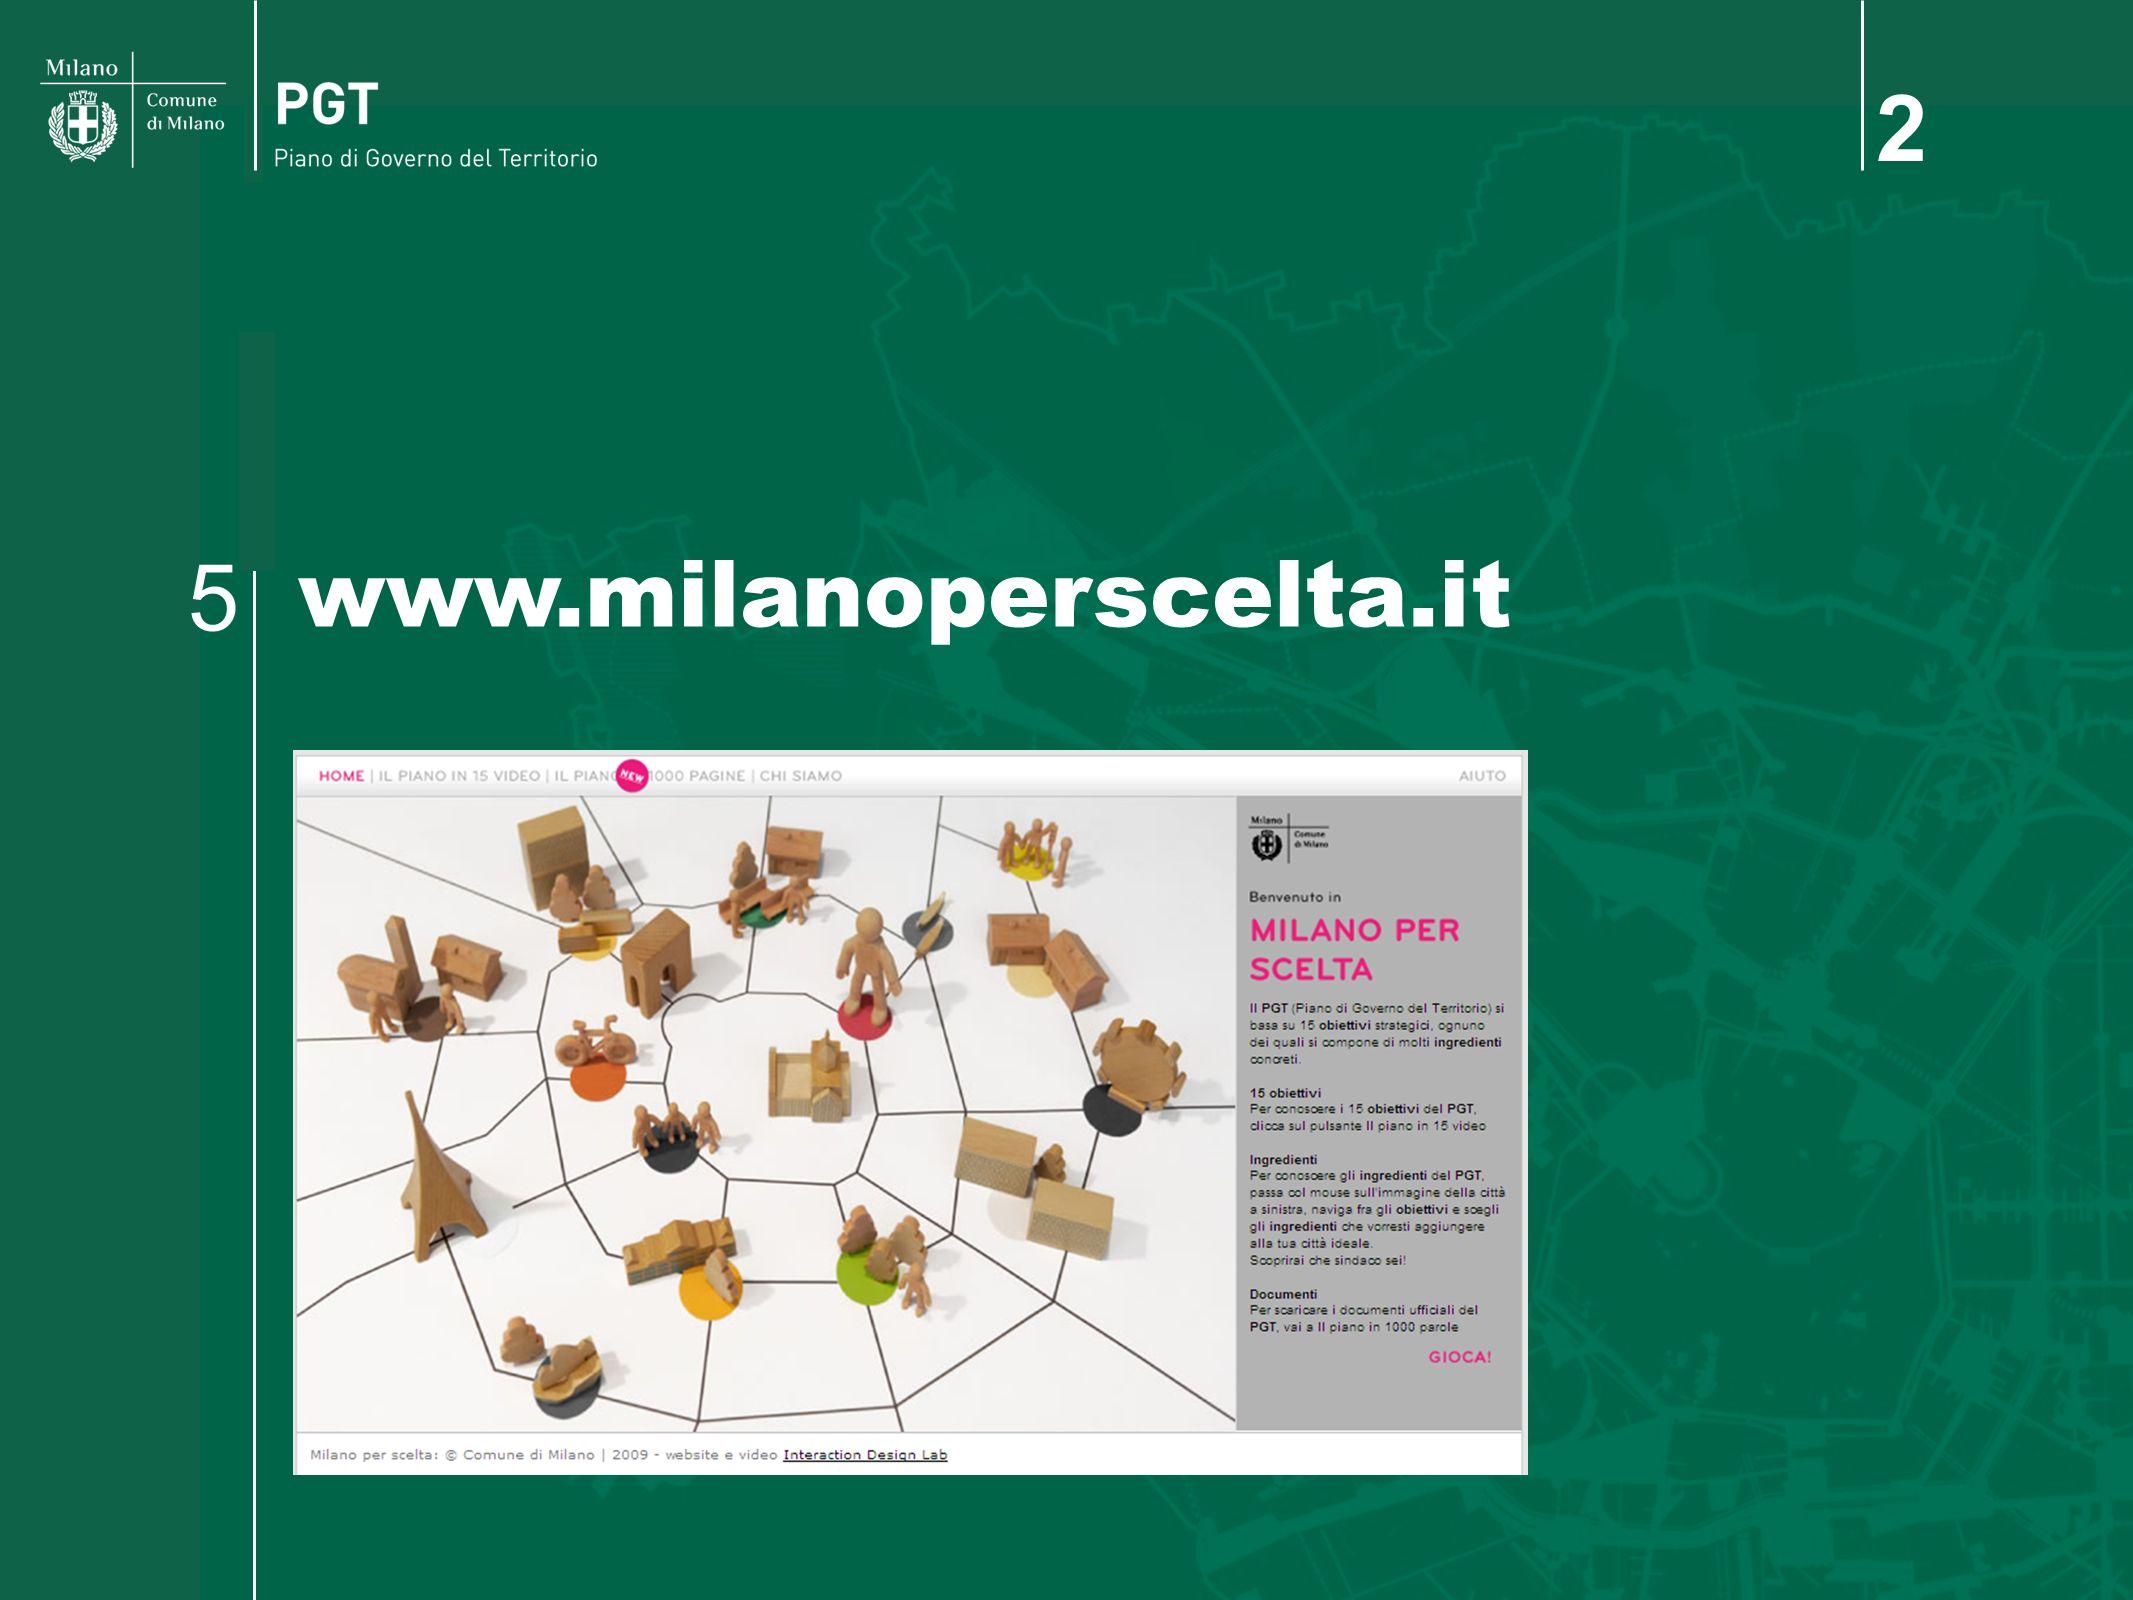 2 www.milanoperscelta.it 5